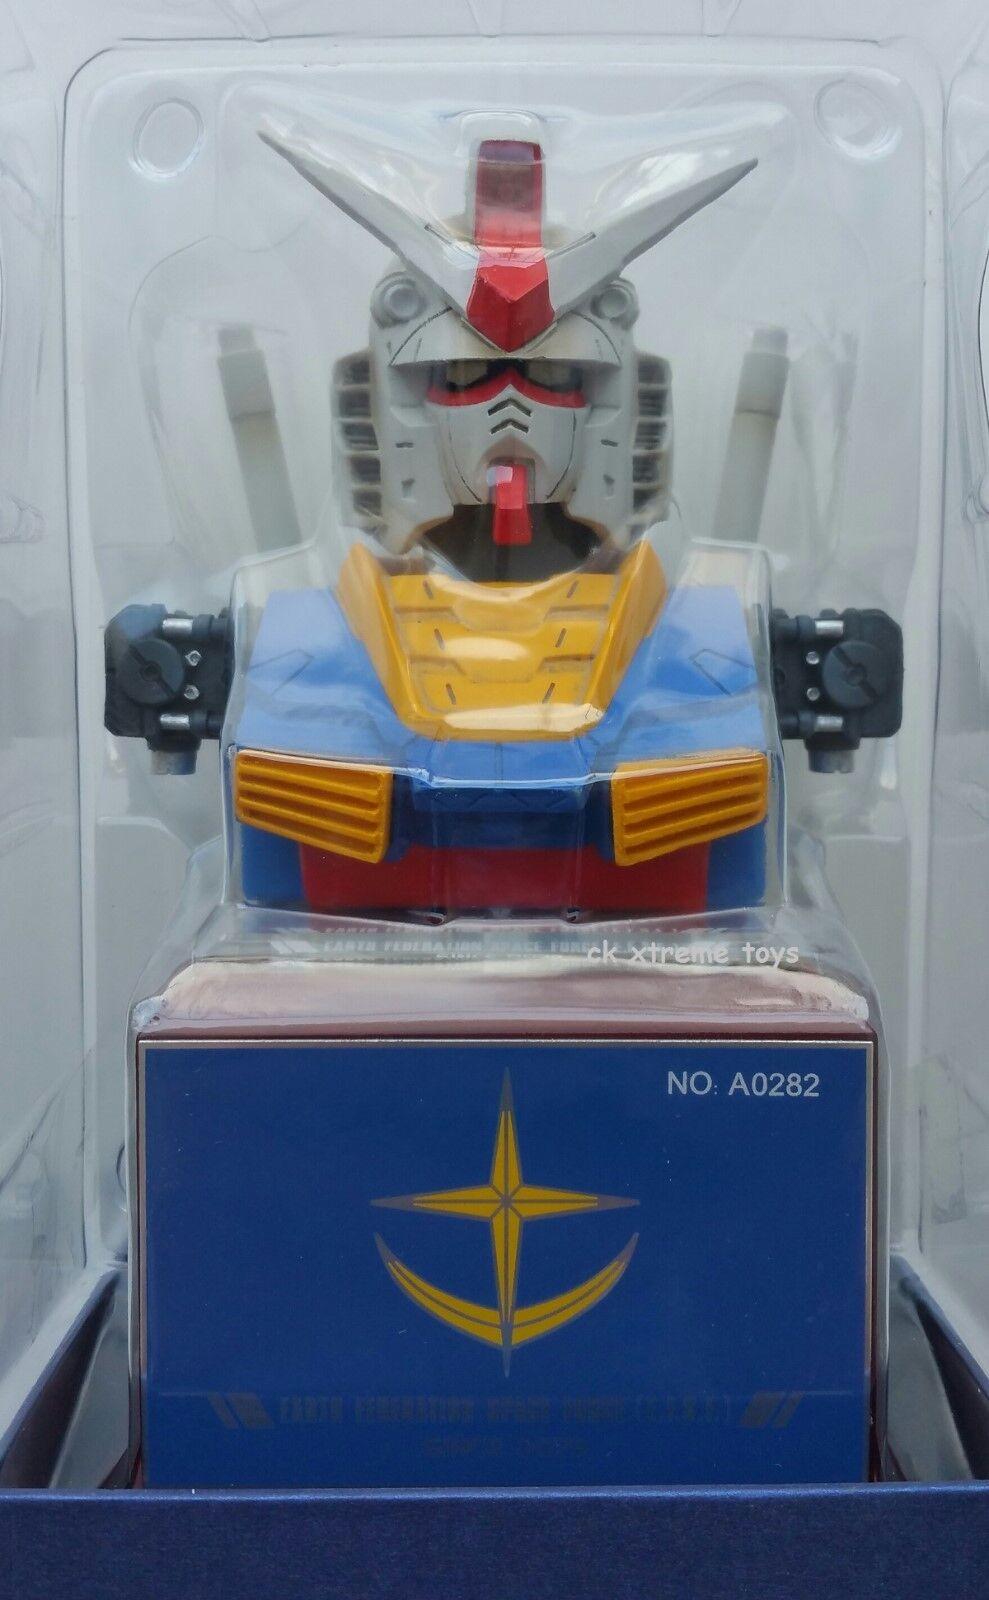 Desktop Gundam Bust Desktop Pen Stand Light Up Eyes E.F.S.F. Mobile Suit RX-78-2